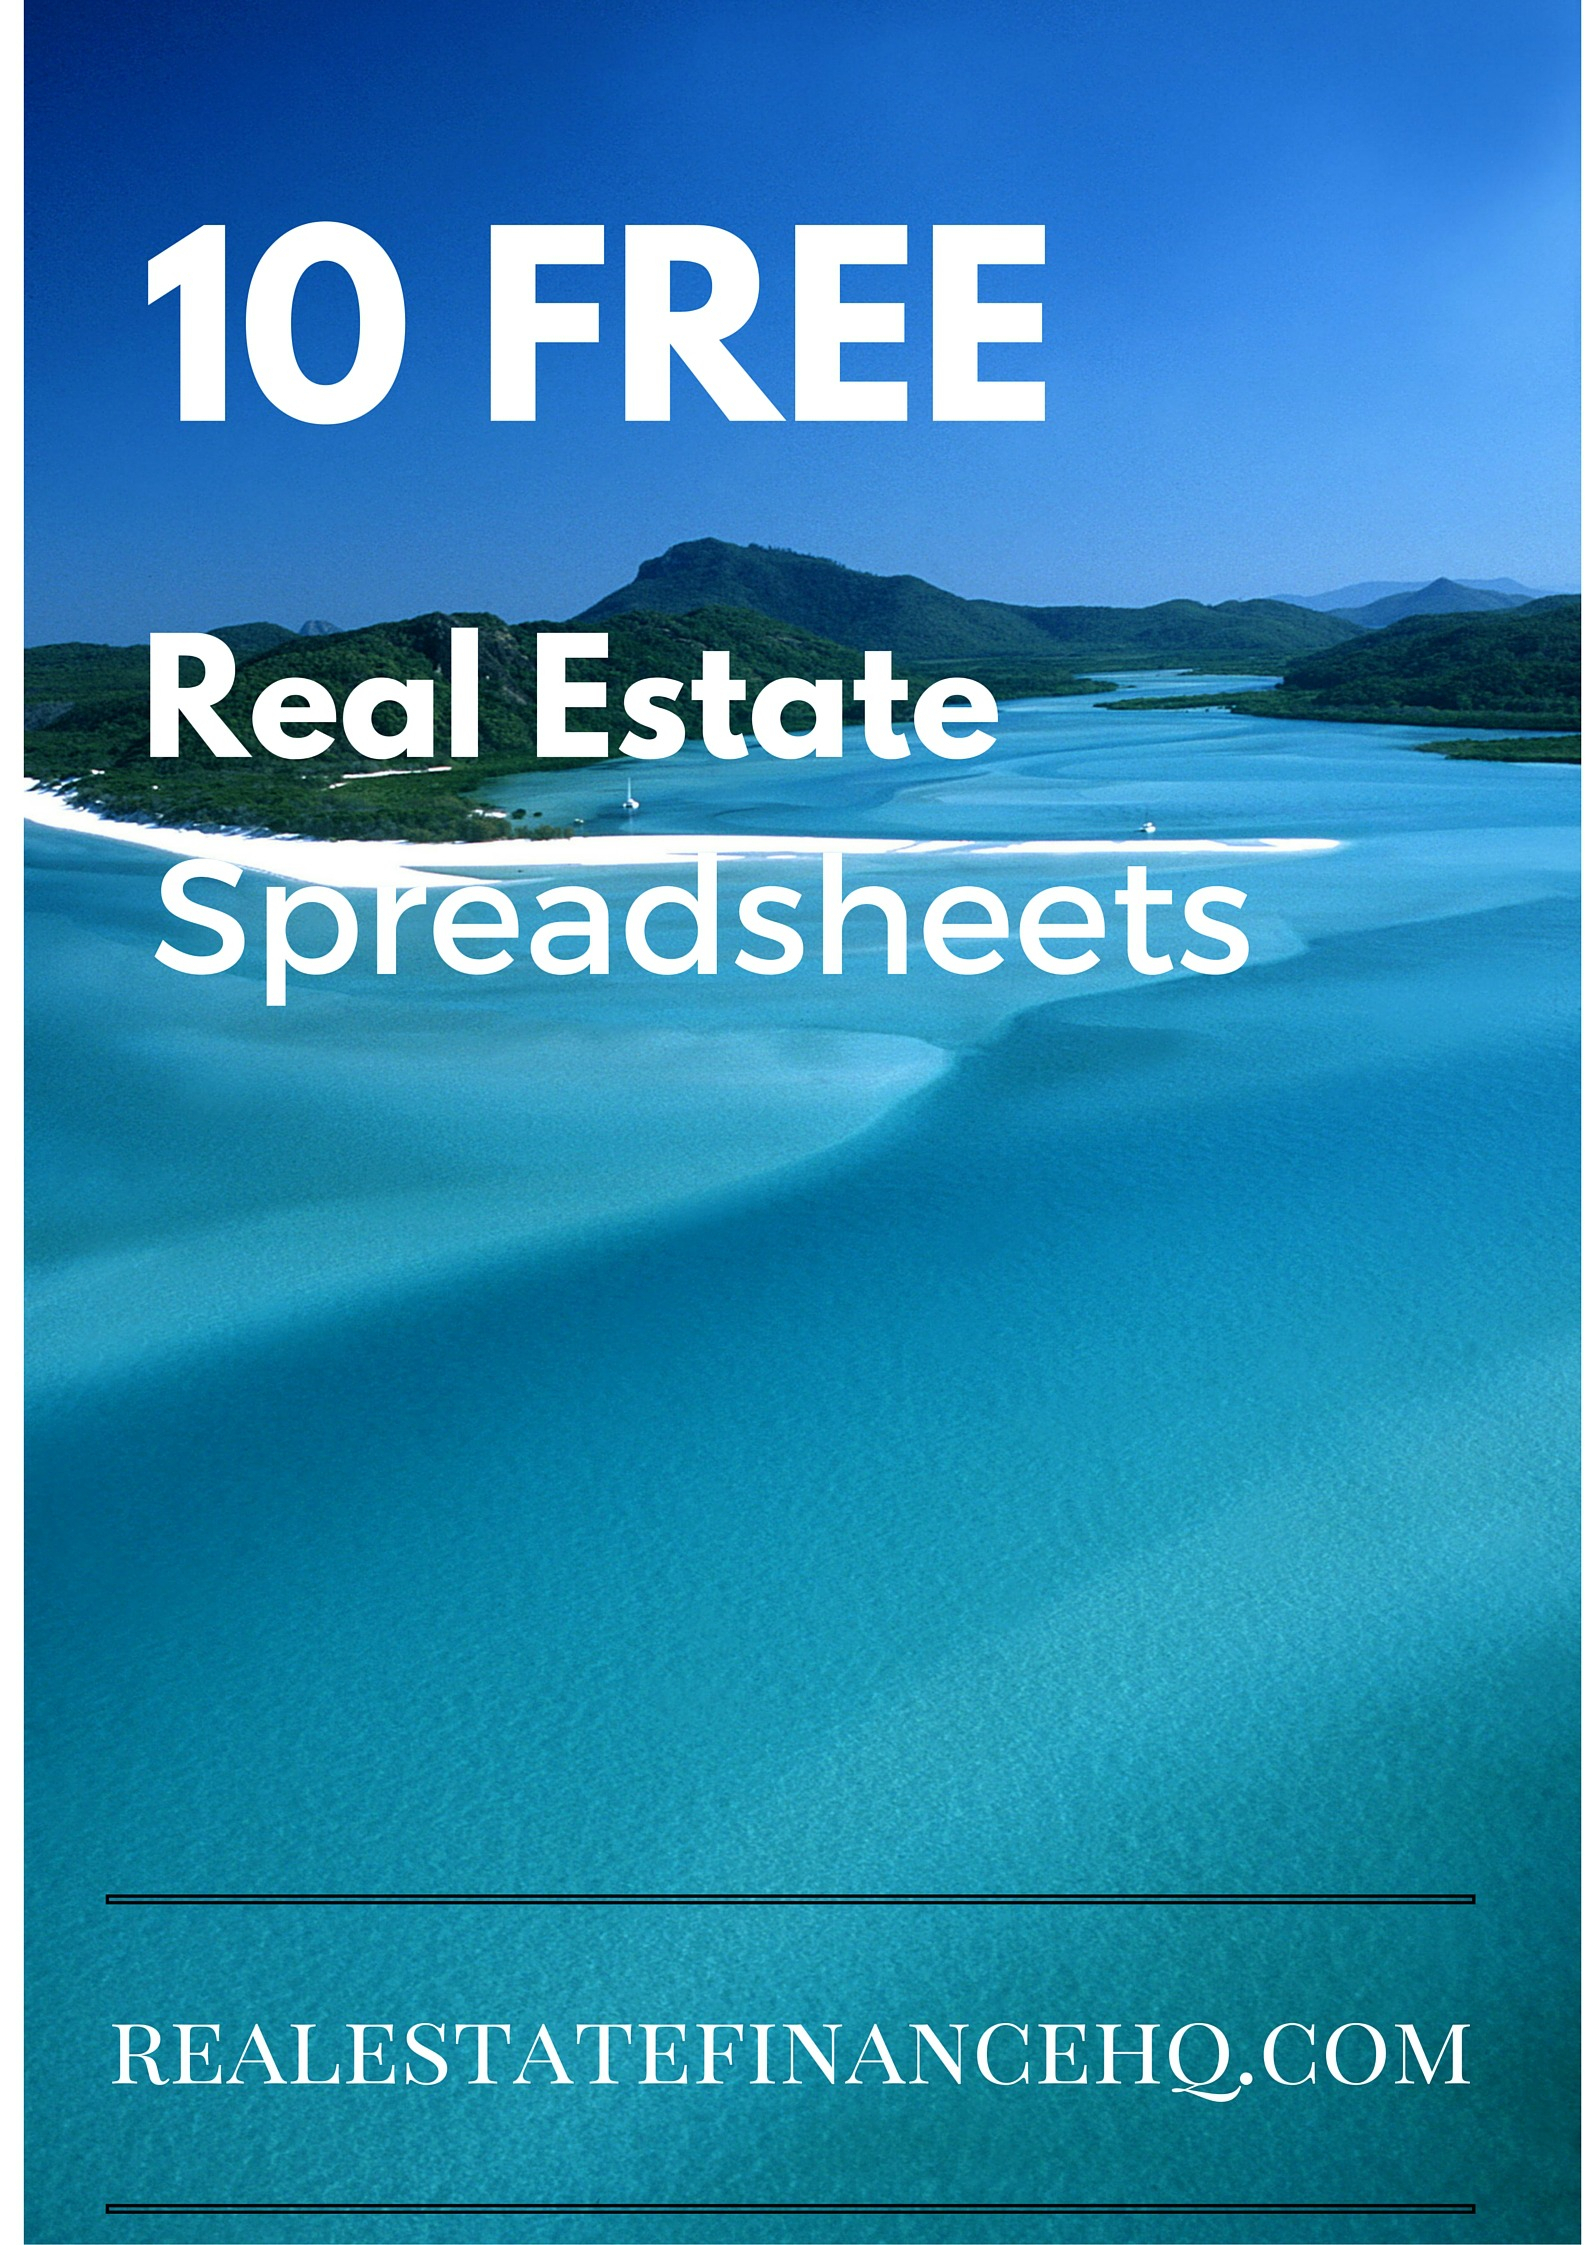 Property Development Spreadsheet Template Uk In 10 Free Real Estate Spreadsheets  Real Estate Finance